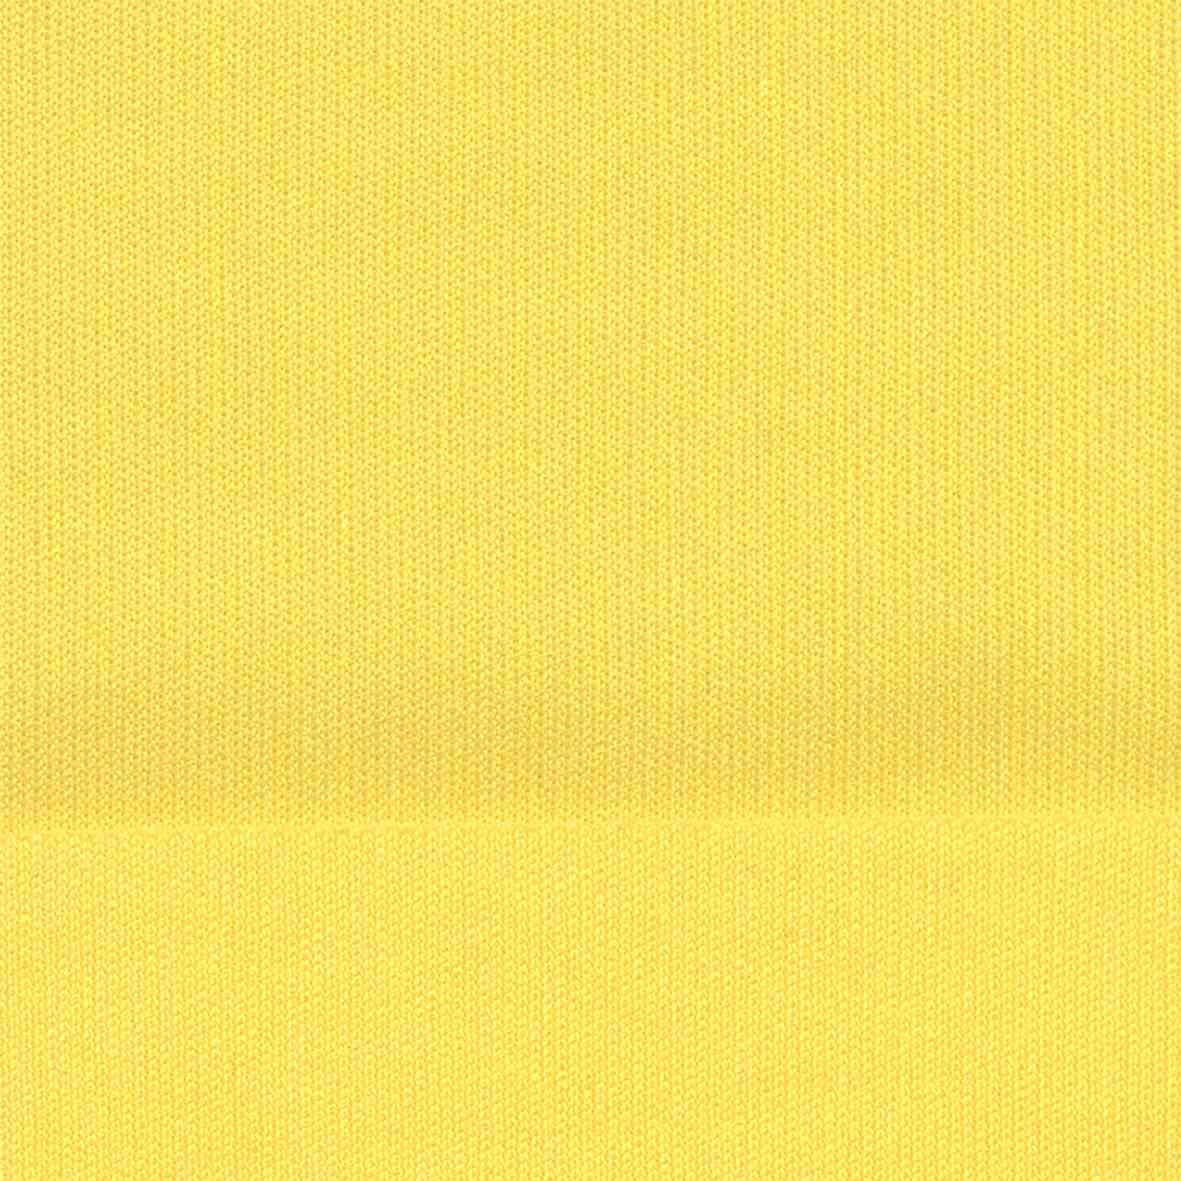 Golfówka m28-001 żółta